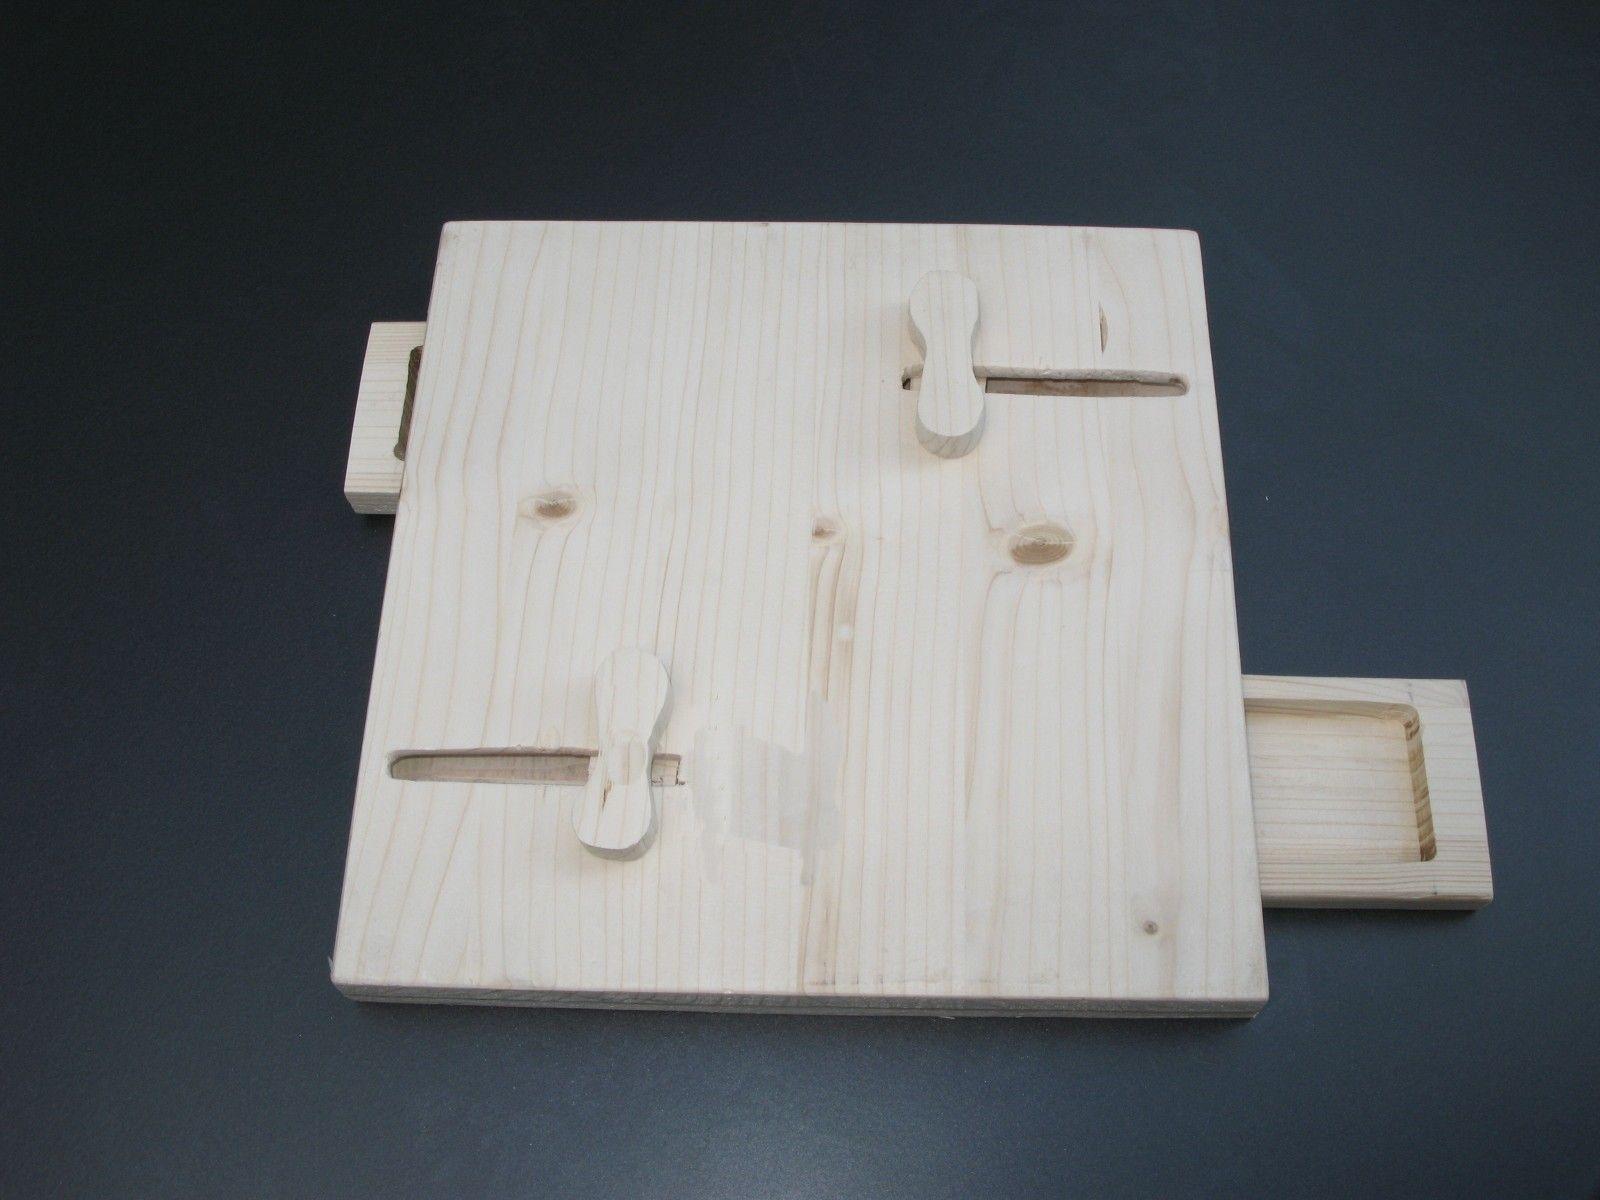 hundespielzeug brain trainer bauanleitung zum selber bauen kerzen pinterest. Black Bedroom Furniture Sets. Home Design Ideas